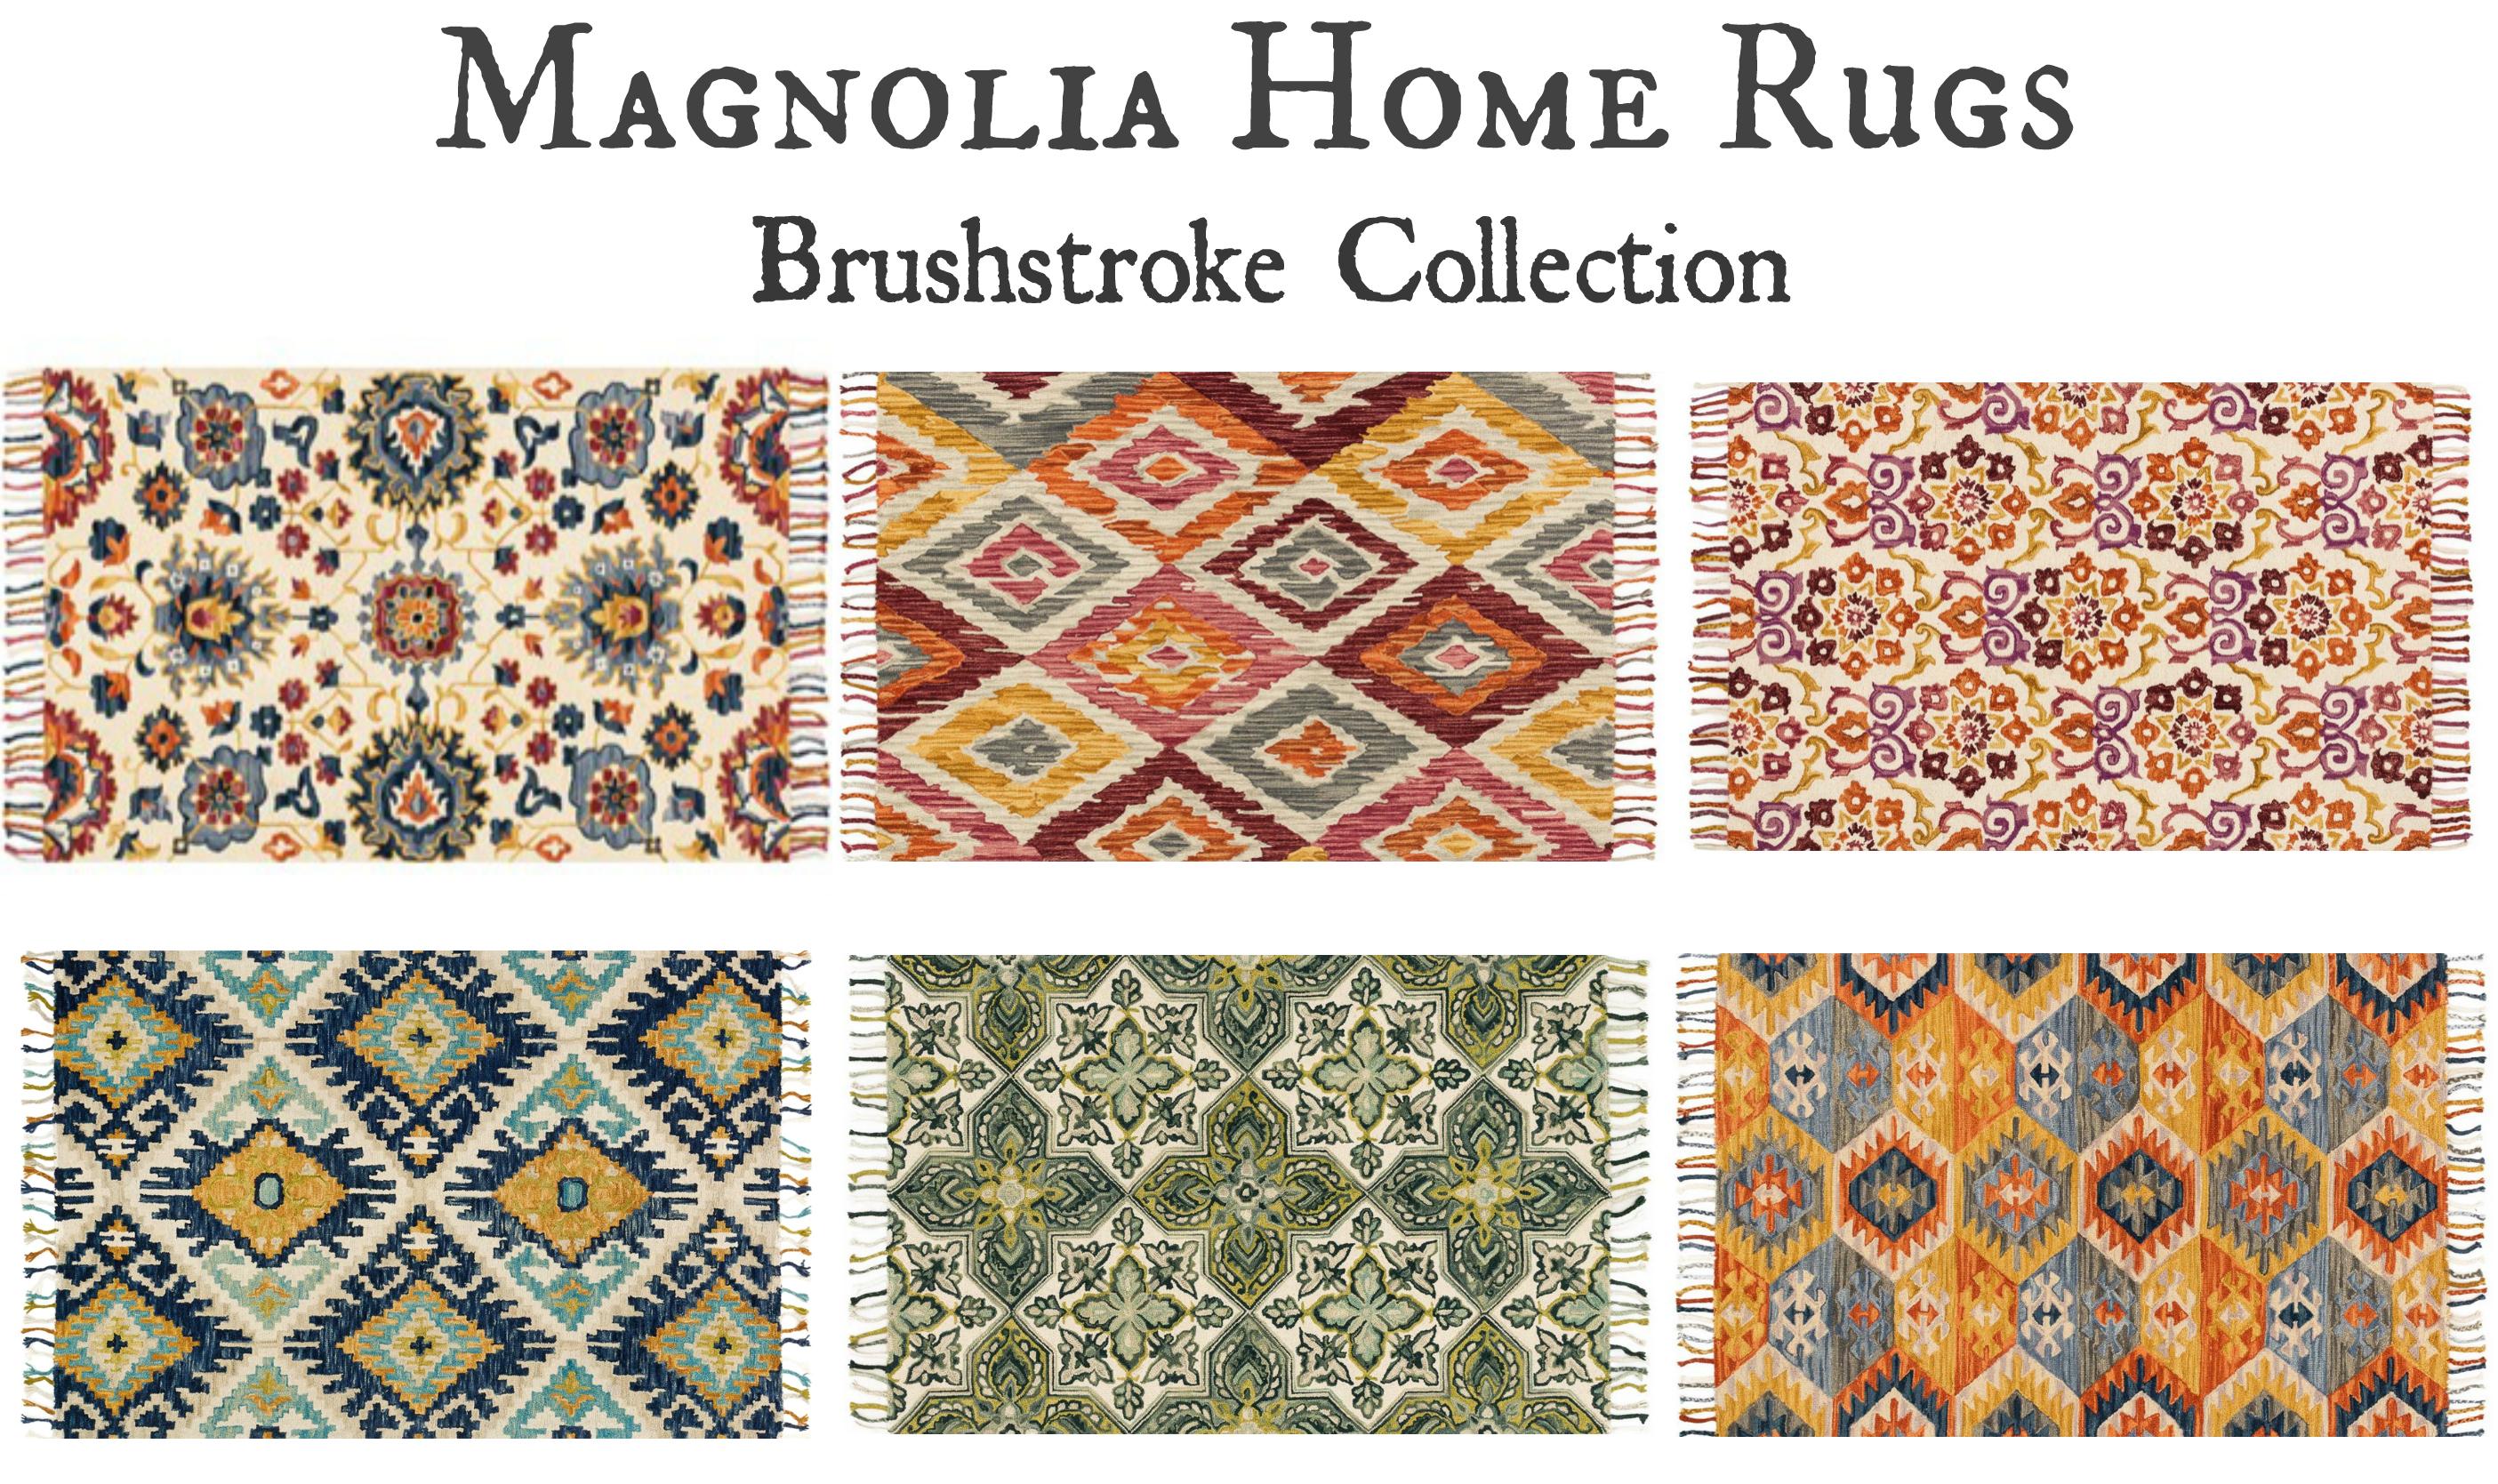 Magnolia Home Rugs